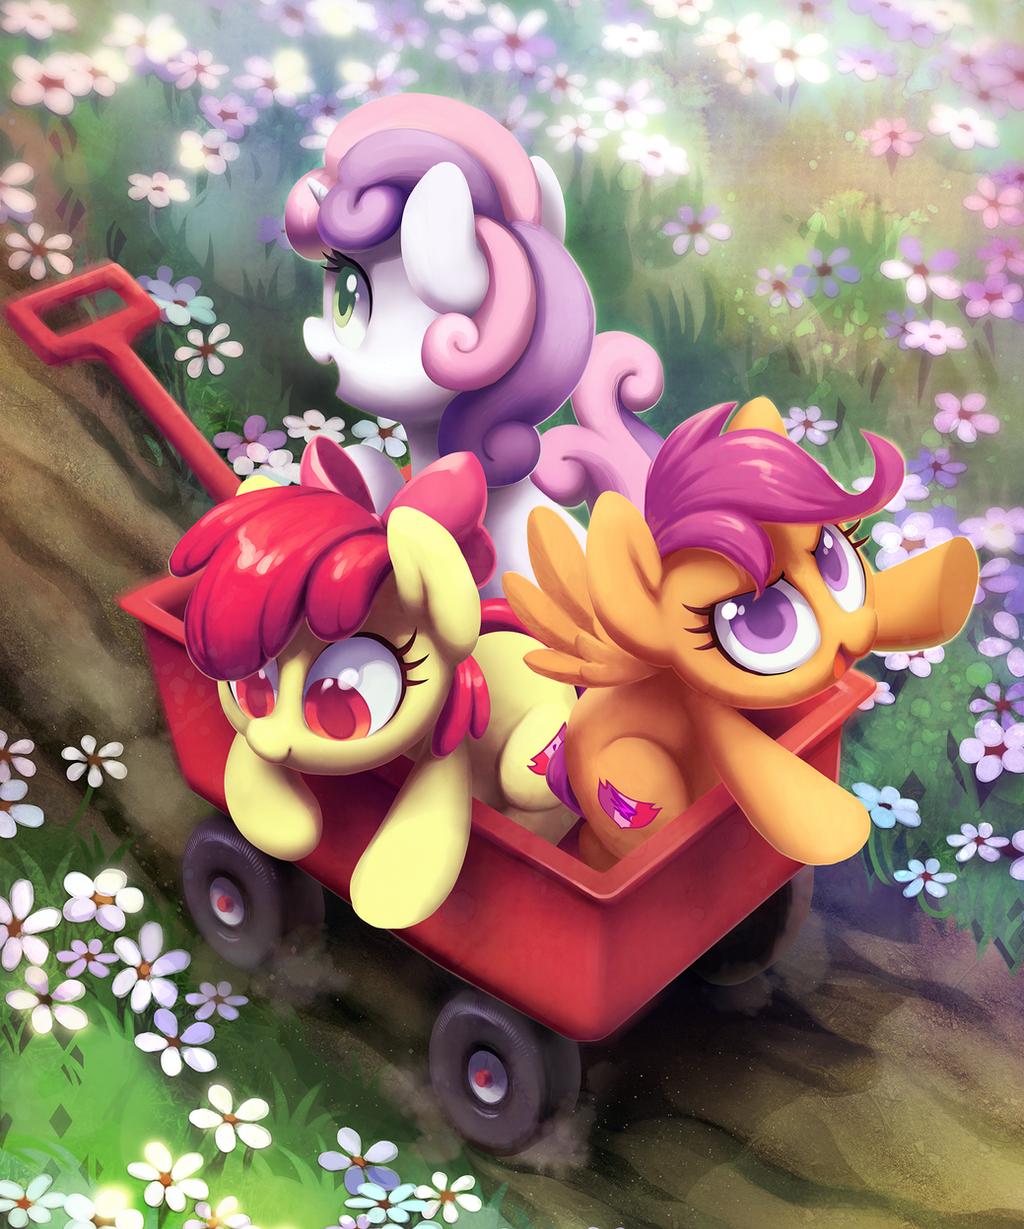 彩虹小马 my little pony